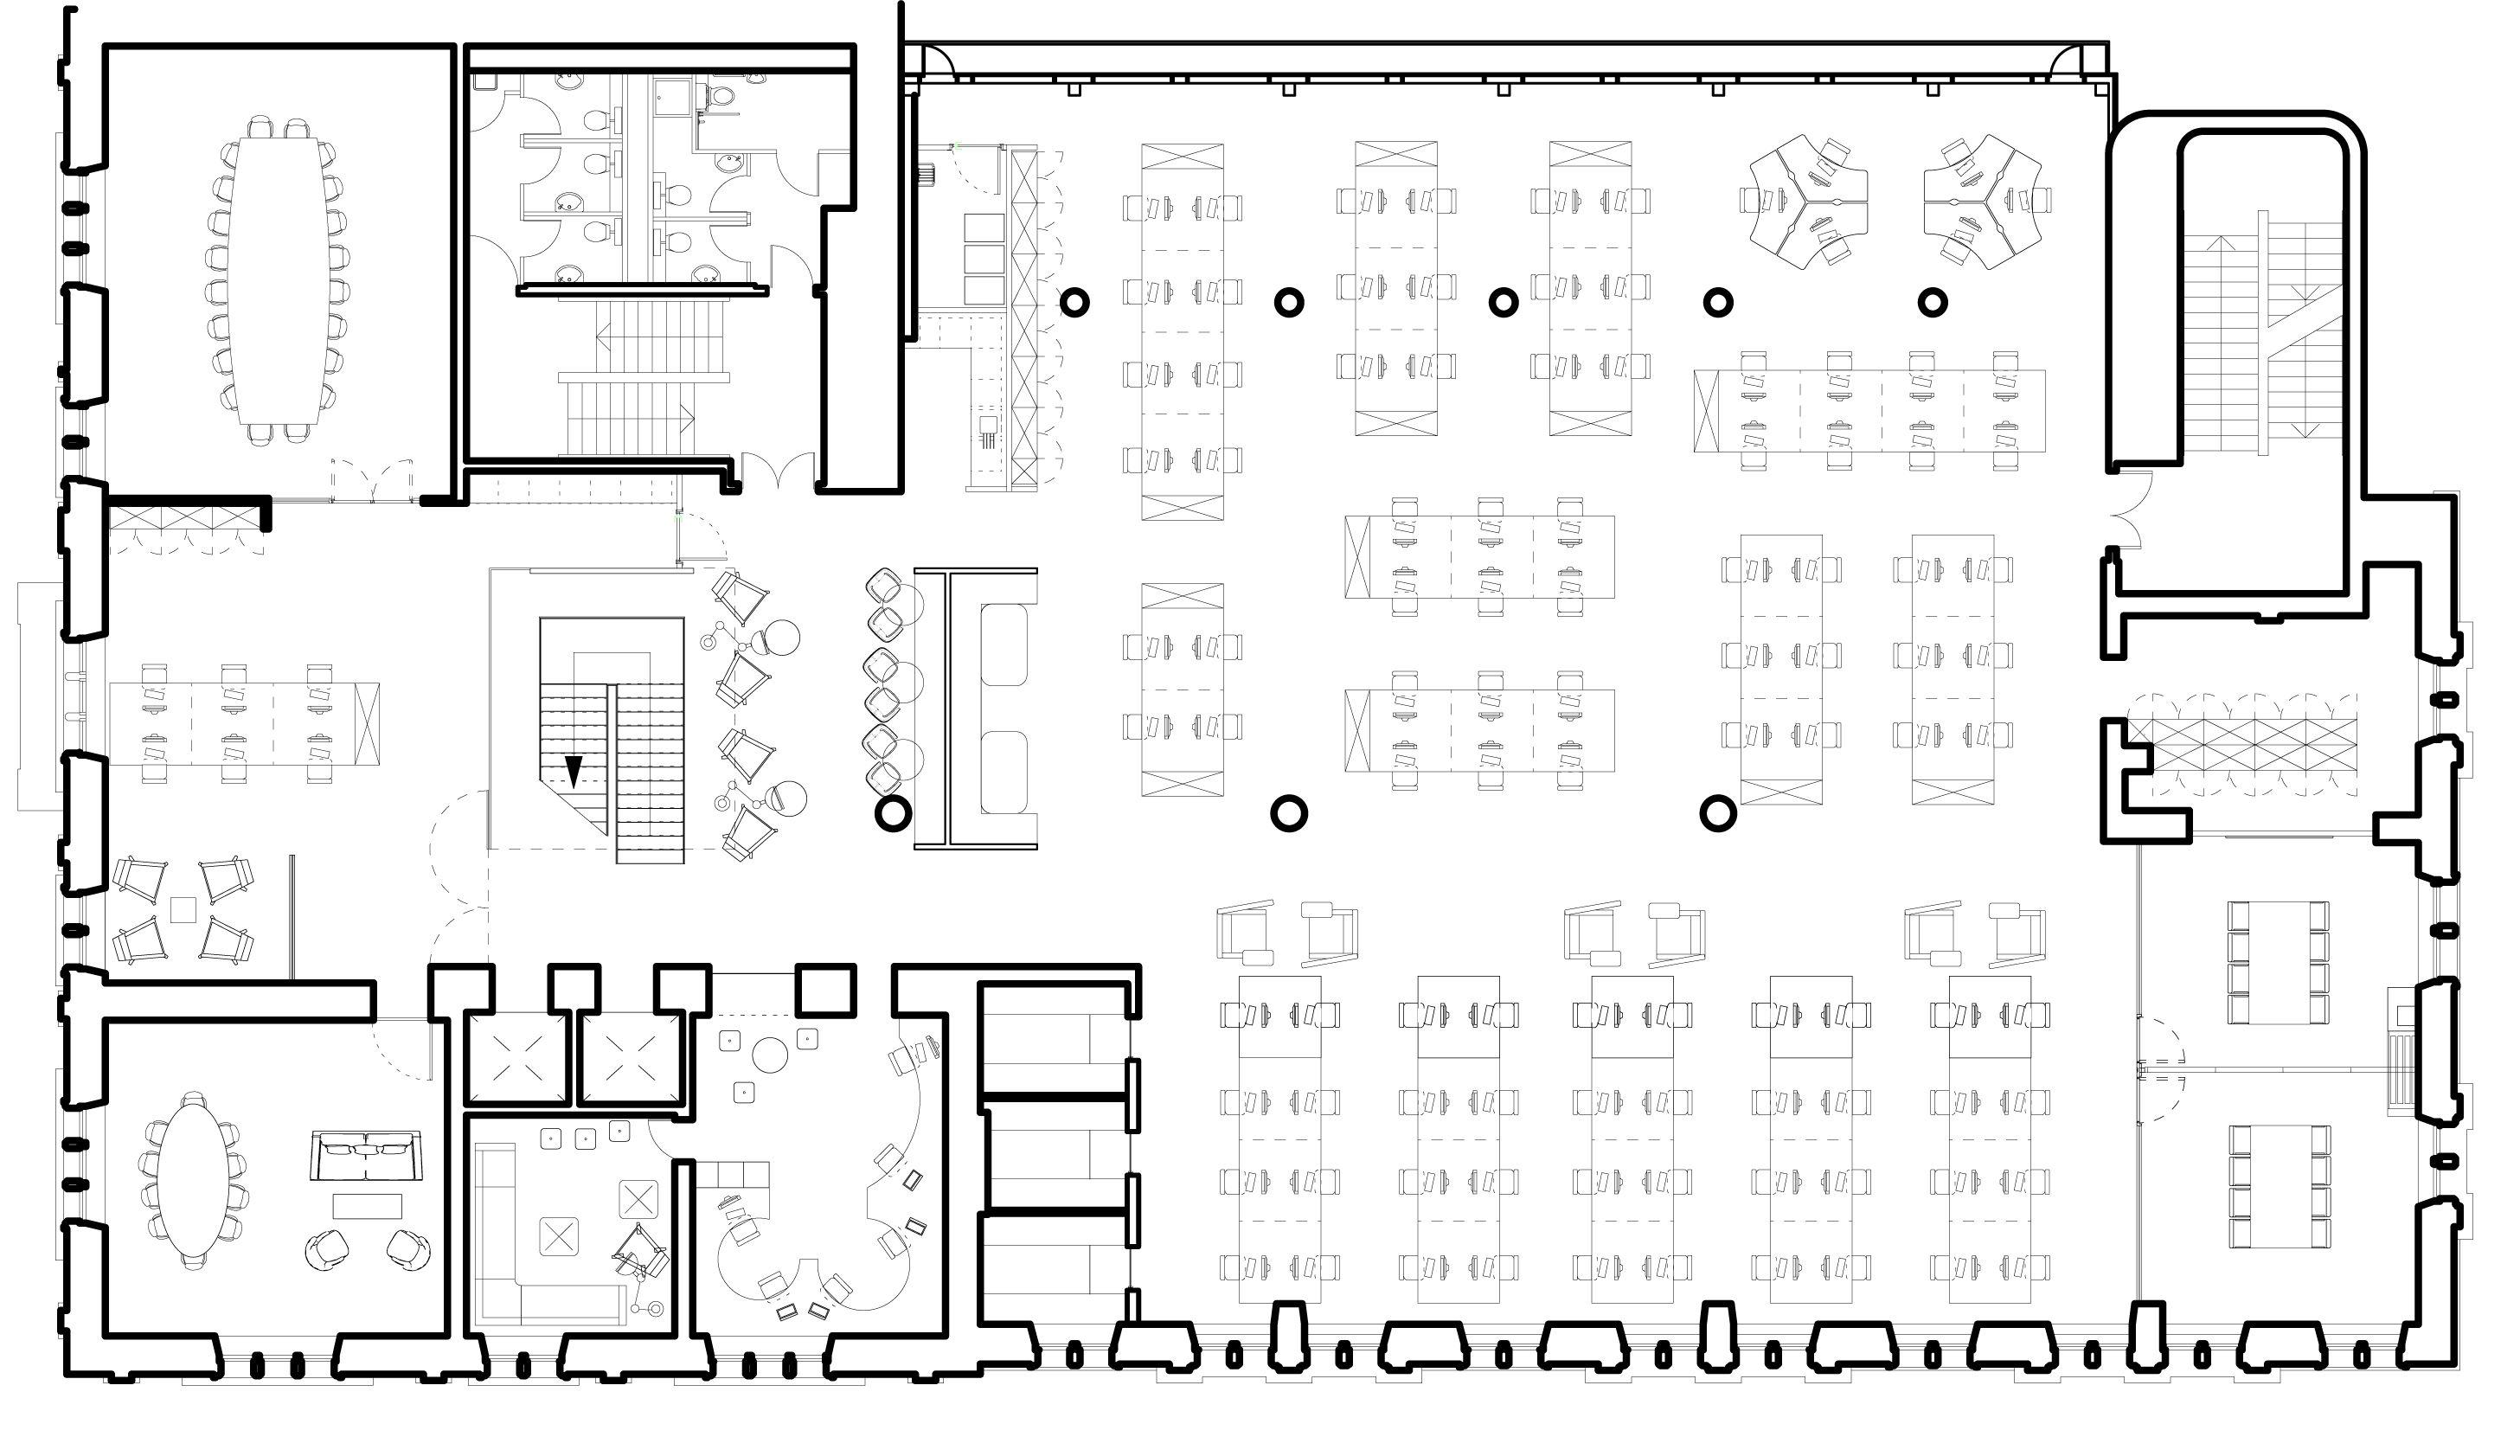 ceo office design floor plan Google Search